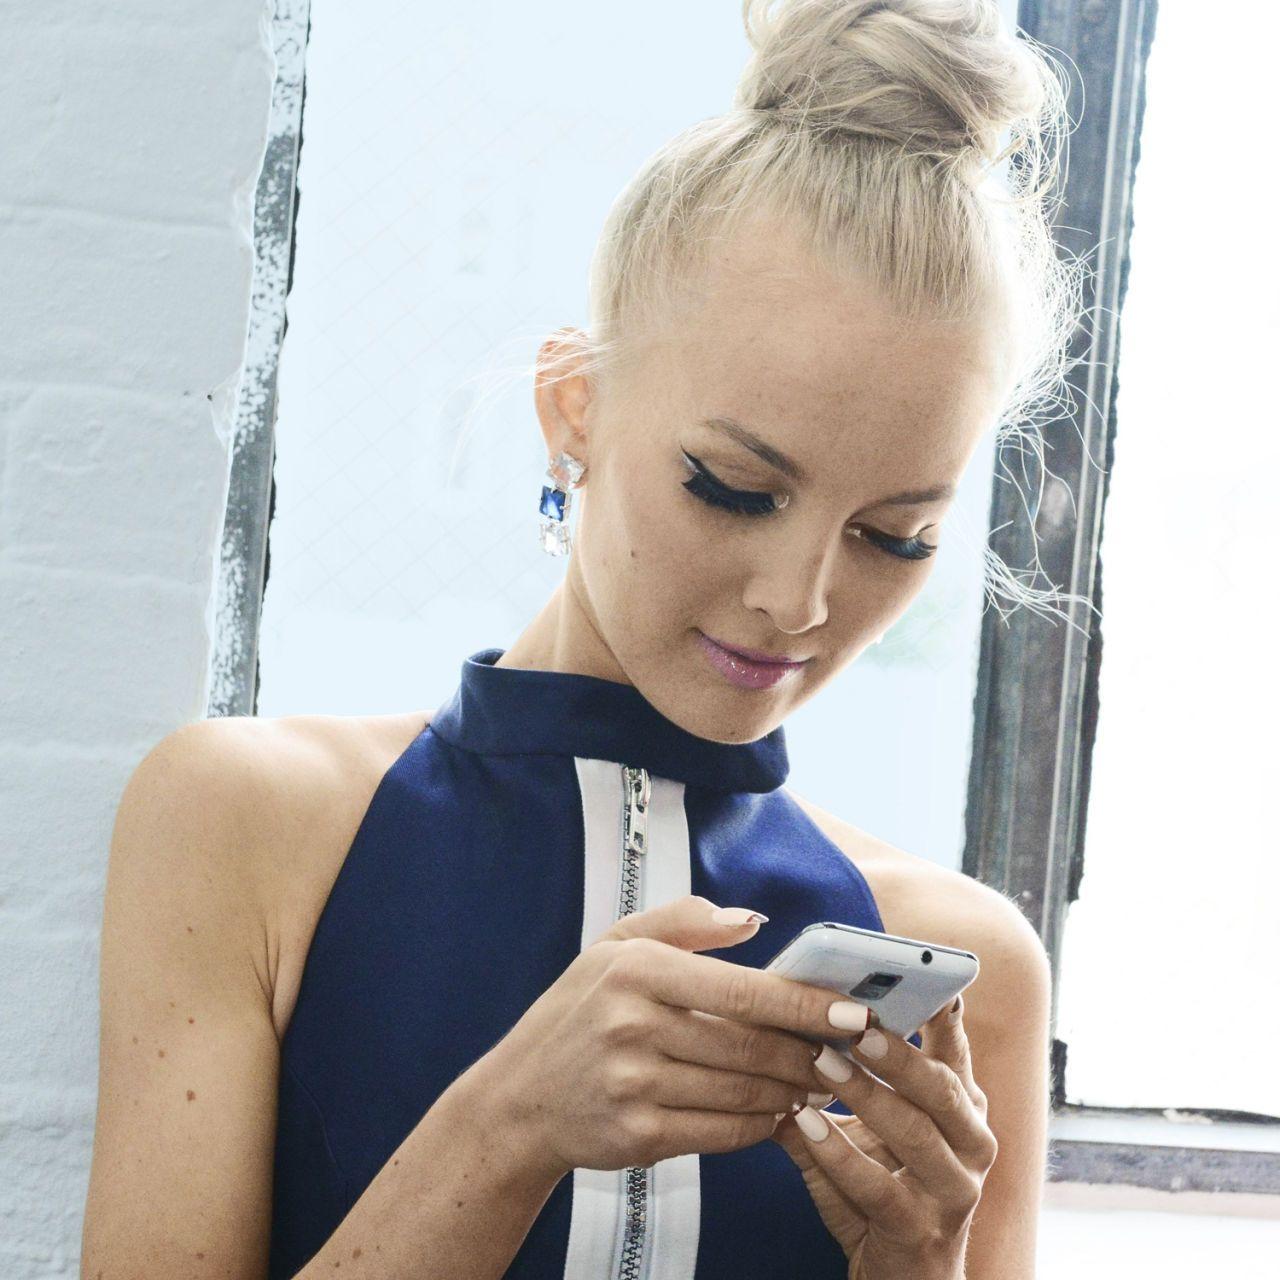 Best online dating sites for 20s makeup